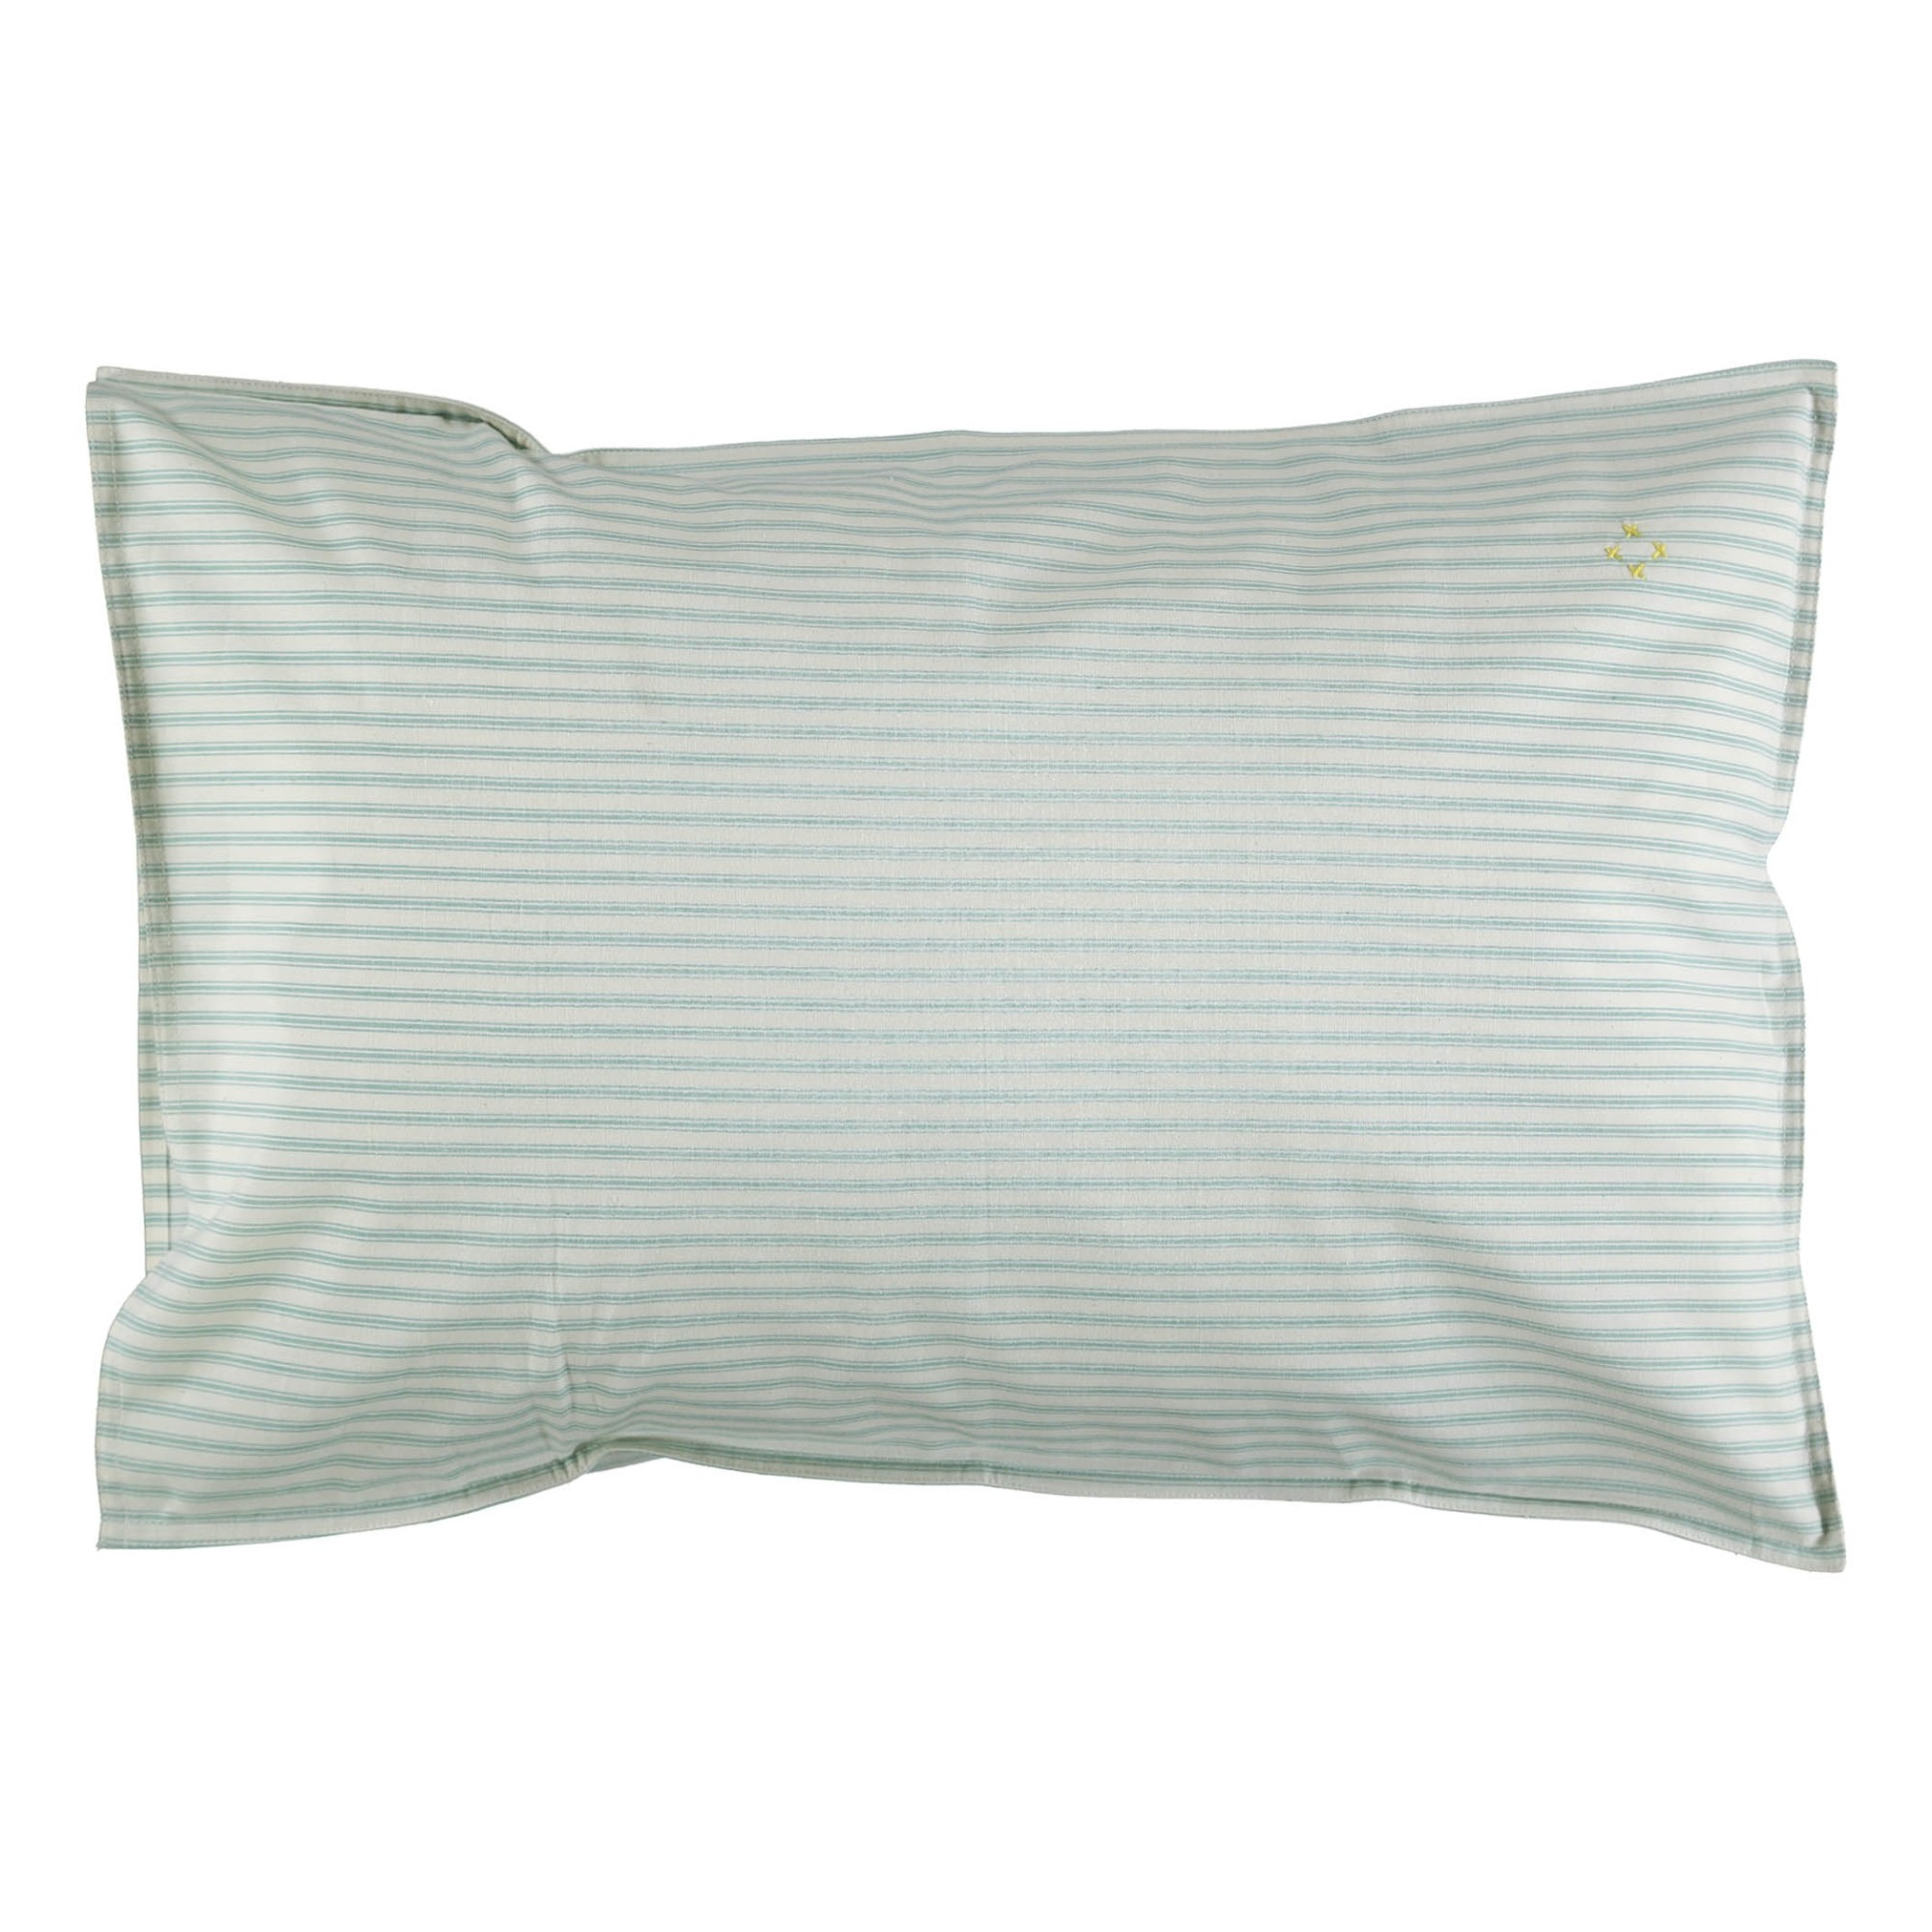 Striped pillow cover Camomile London